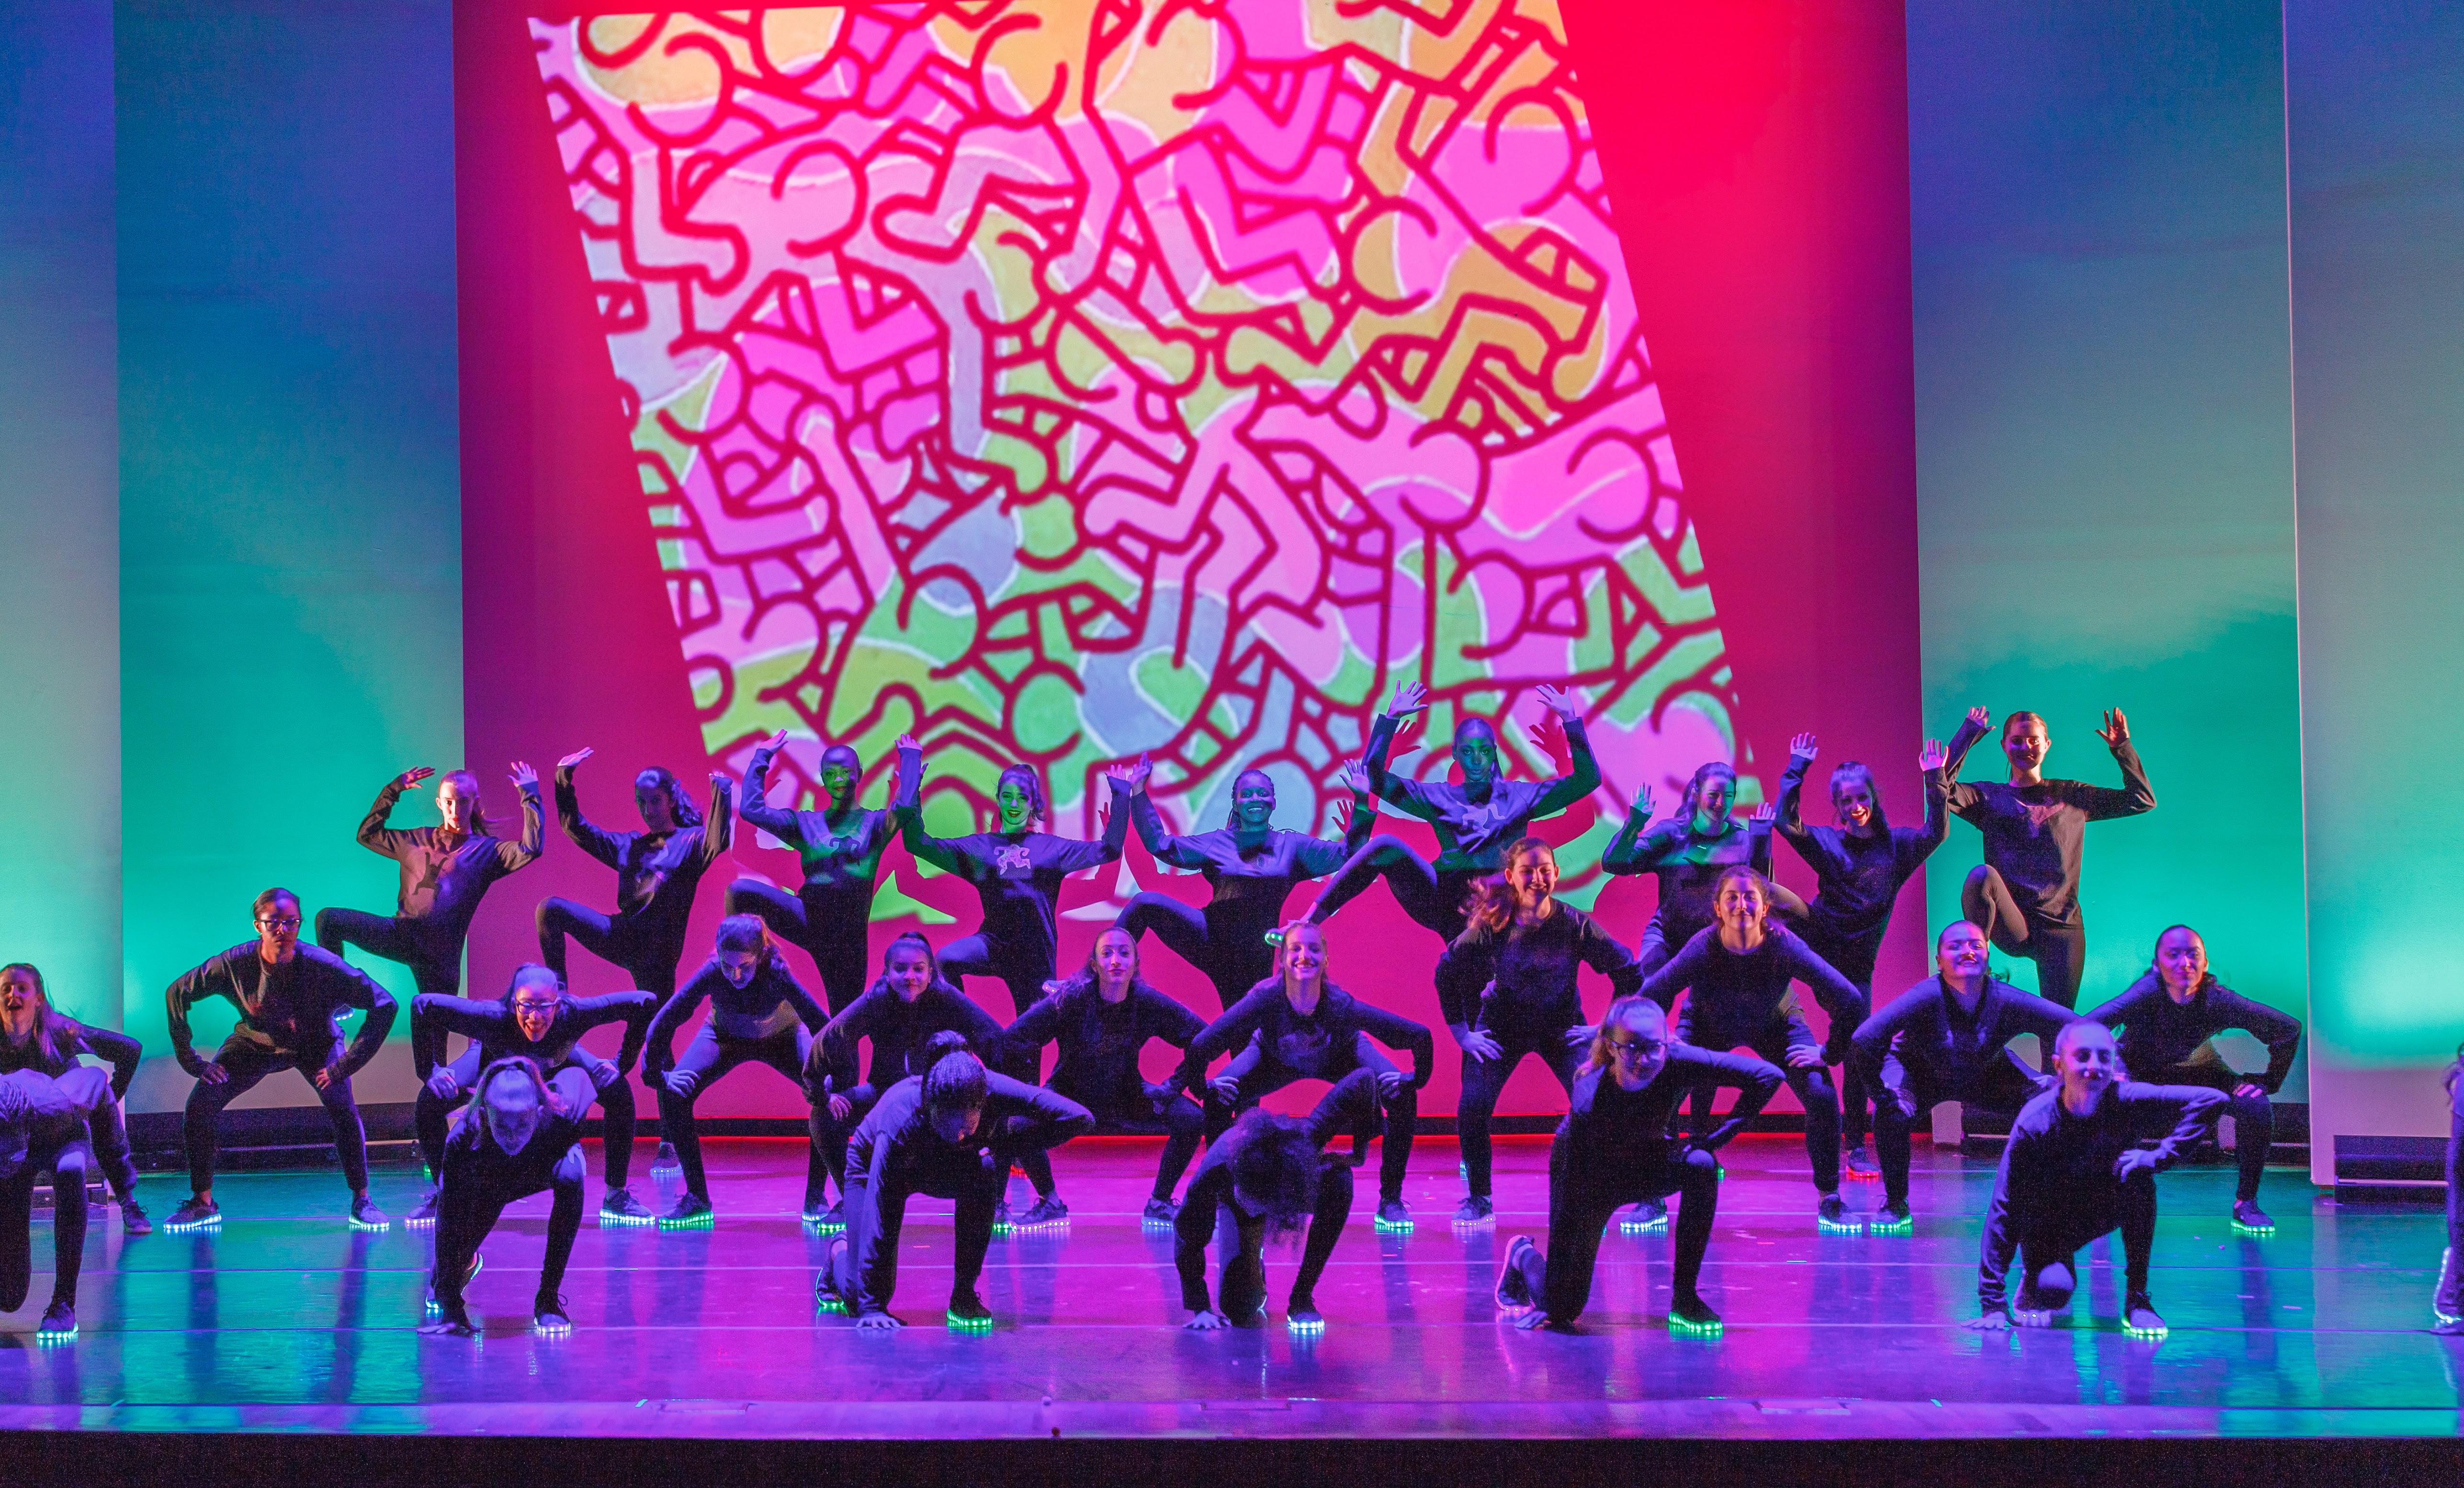 ARCHER NIGHT OF DANCE 2017